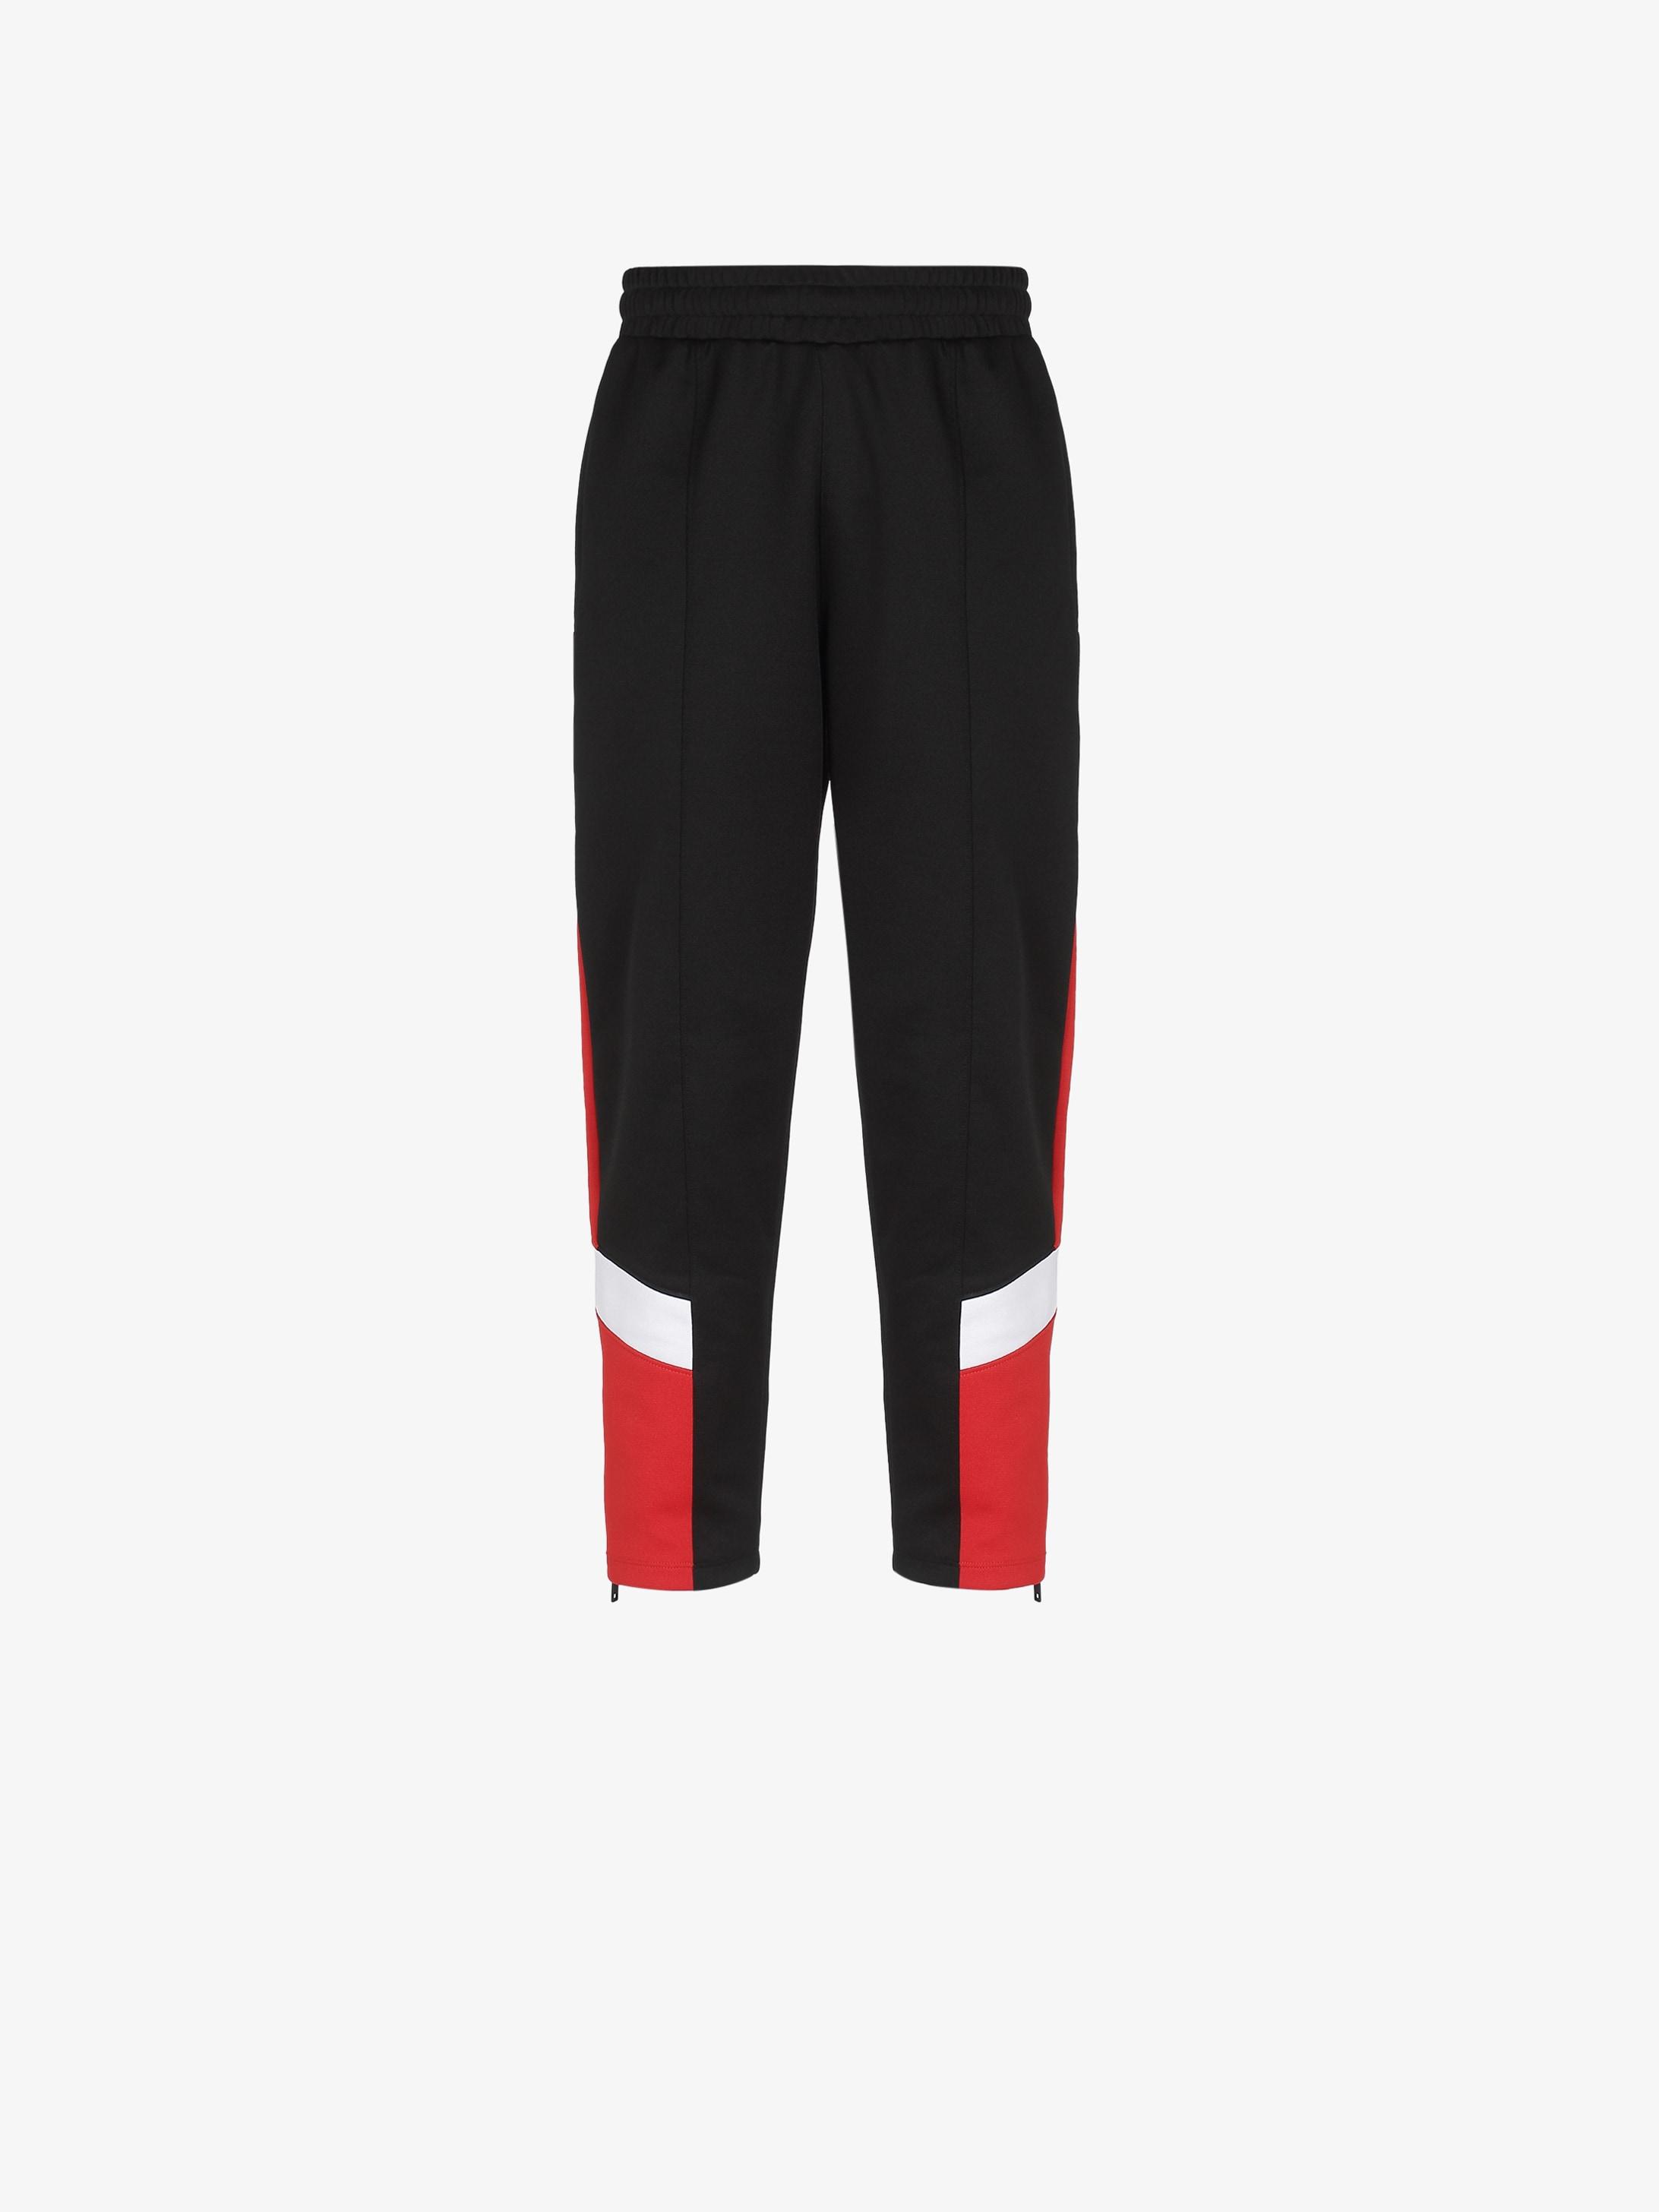 GIVENCHY contrasting jogger pants